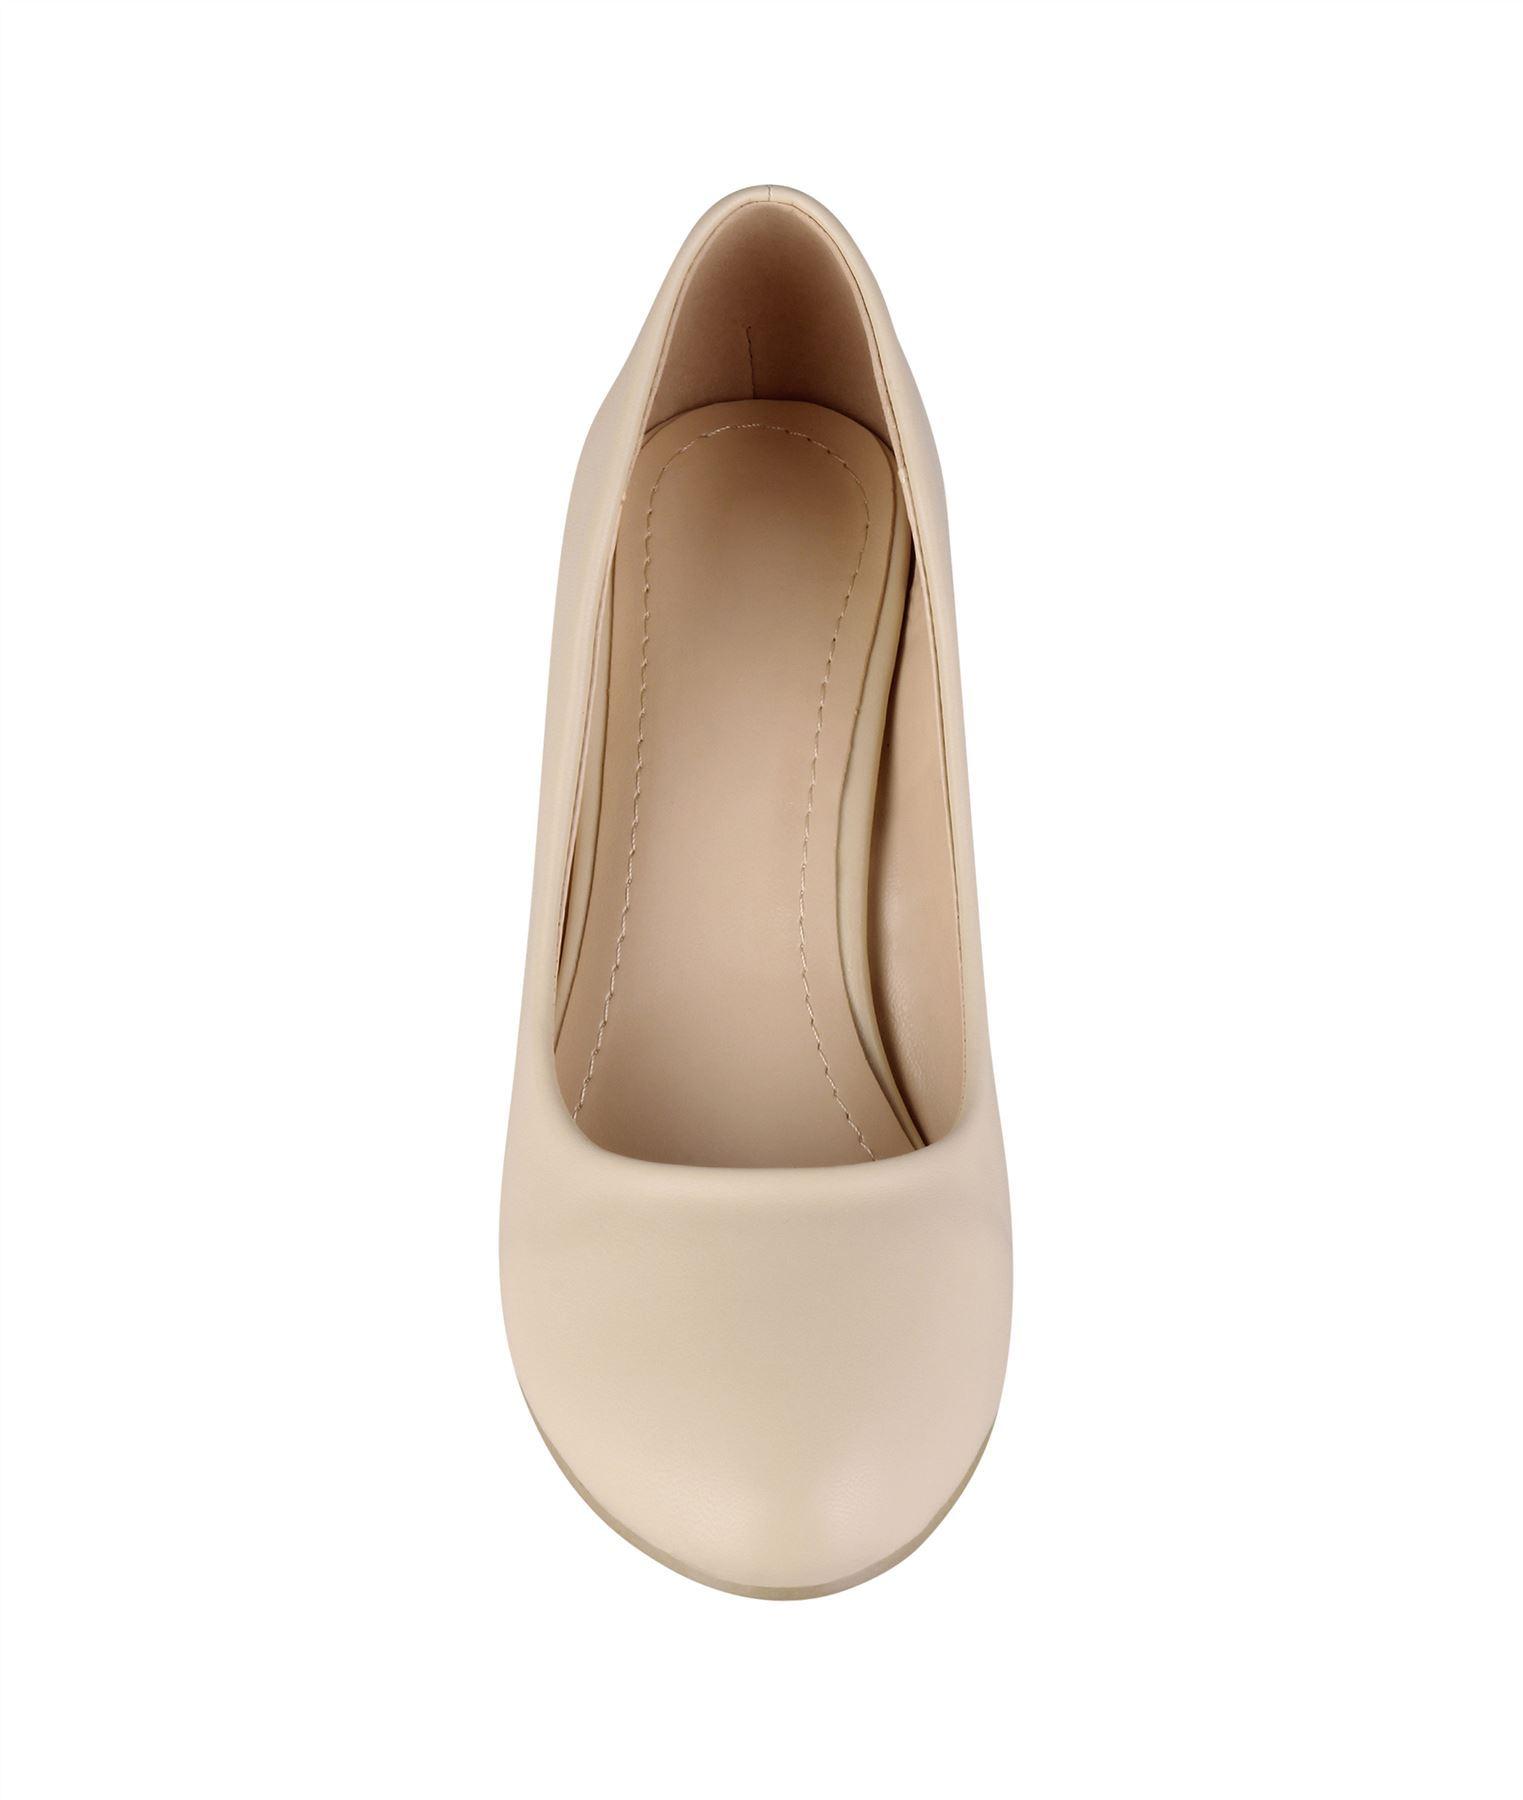 Womens-Ladies-Mid-Heel-Court-Shoes-Slip-On-Low-Kitten-Heels-Pumps-Matte-Size-3-8 thumbnail 4